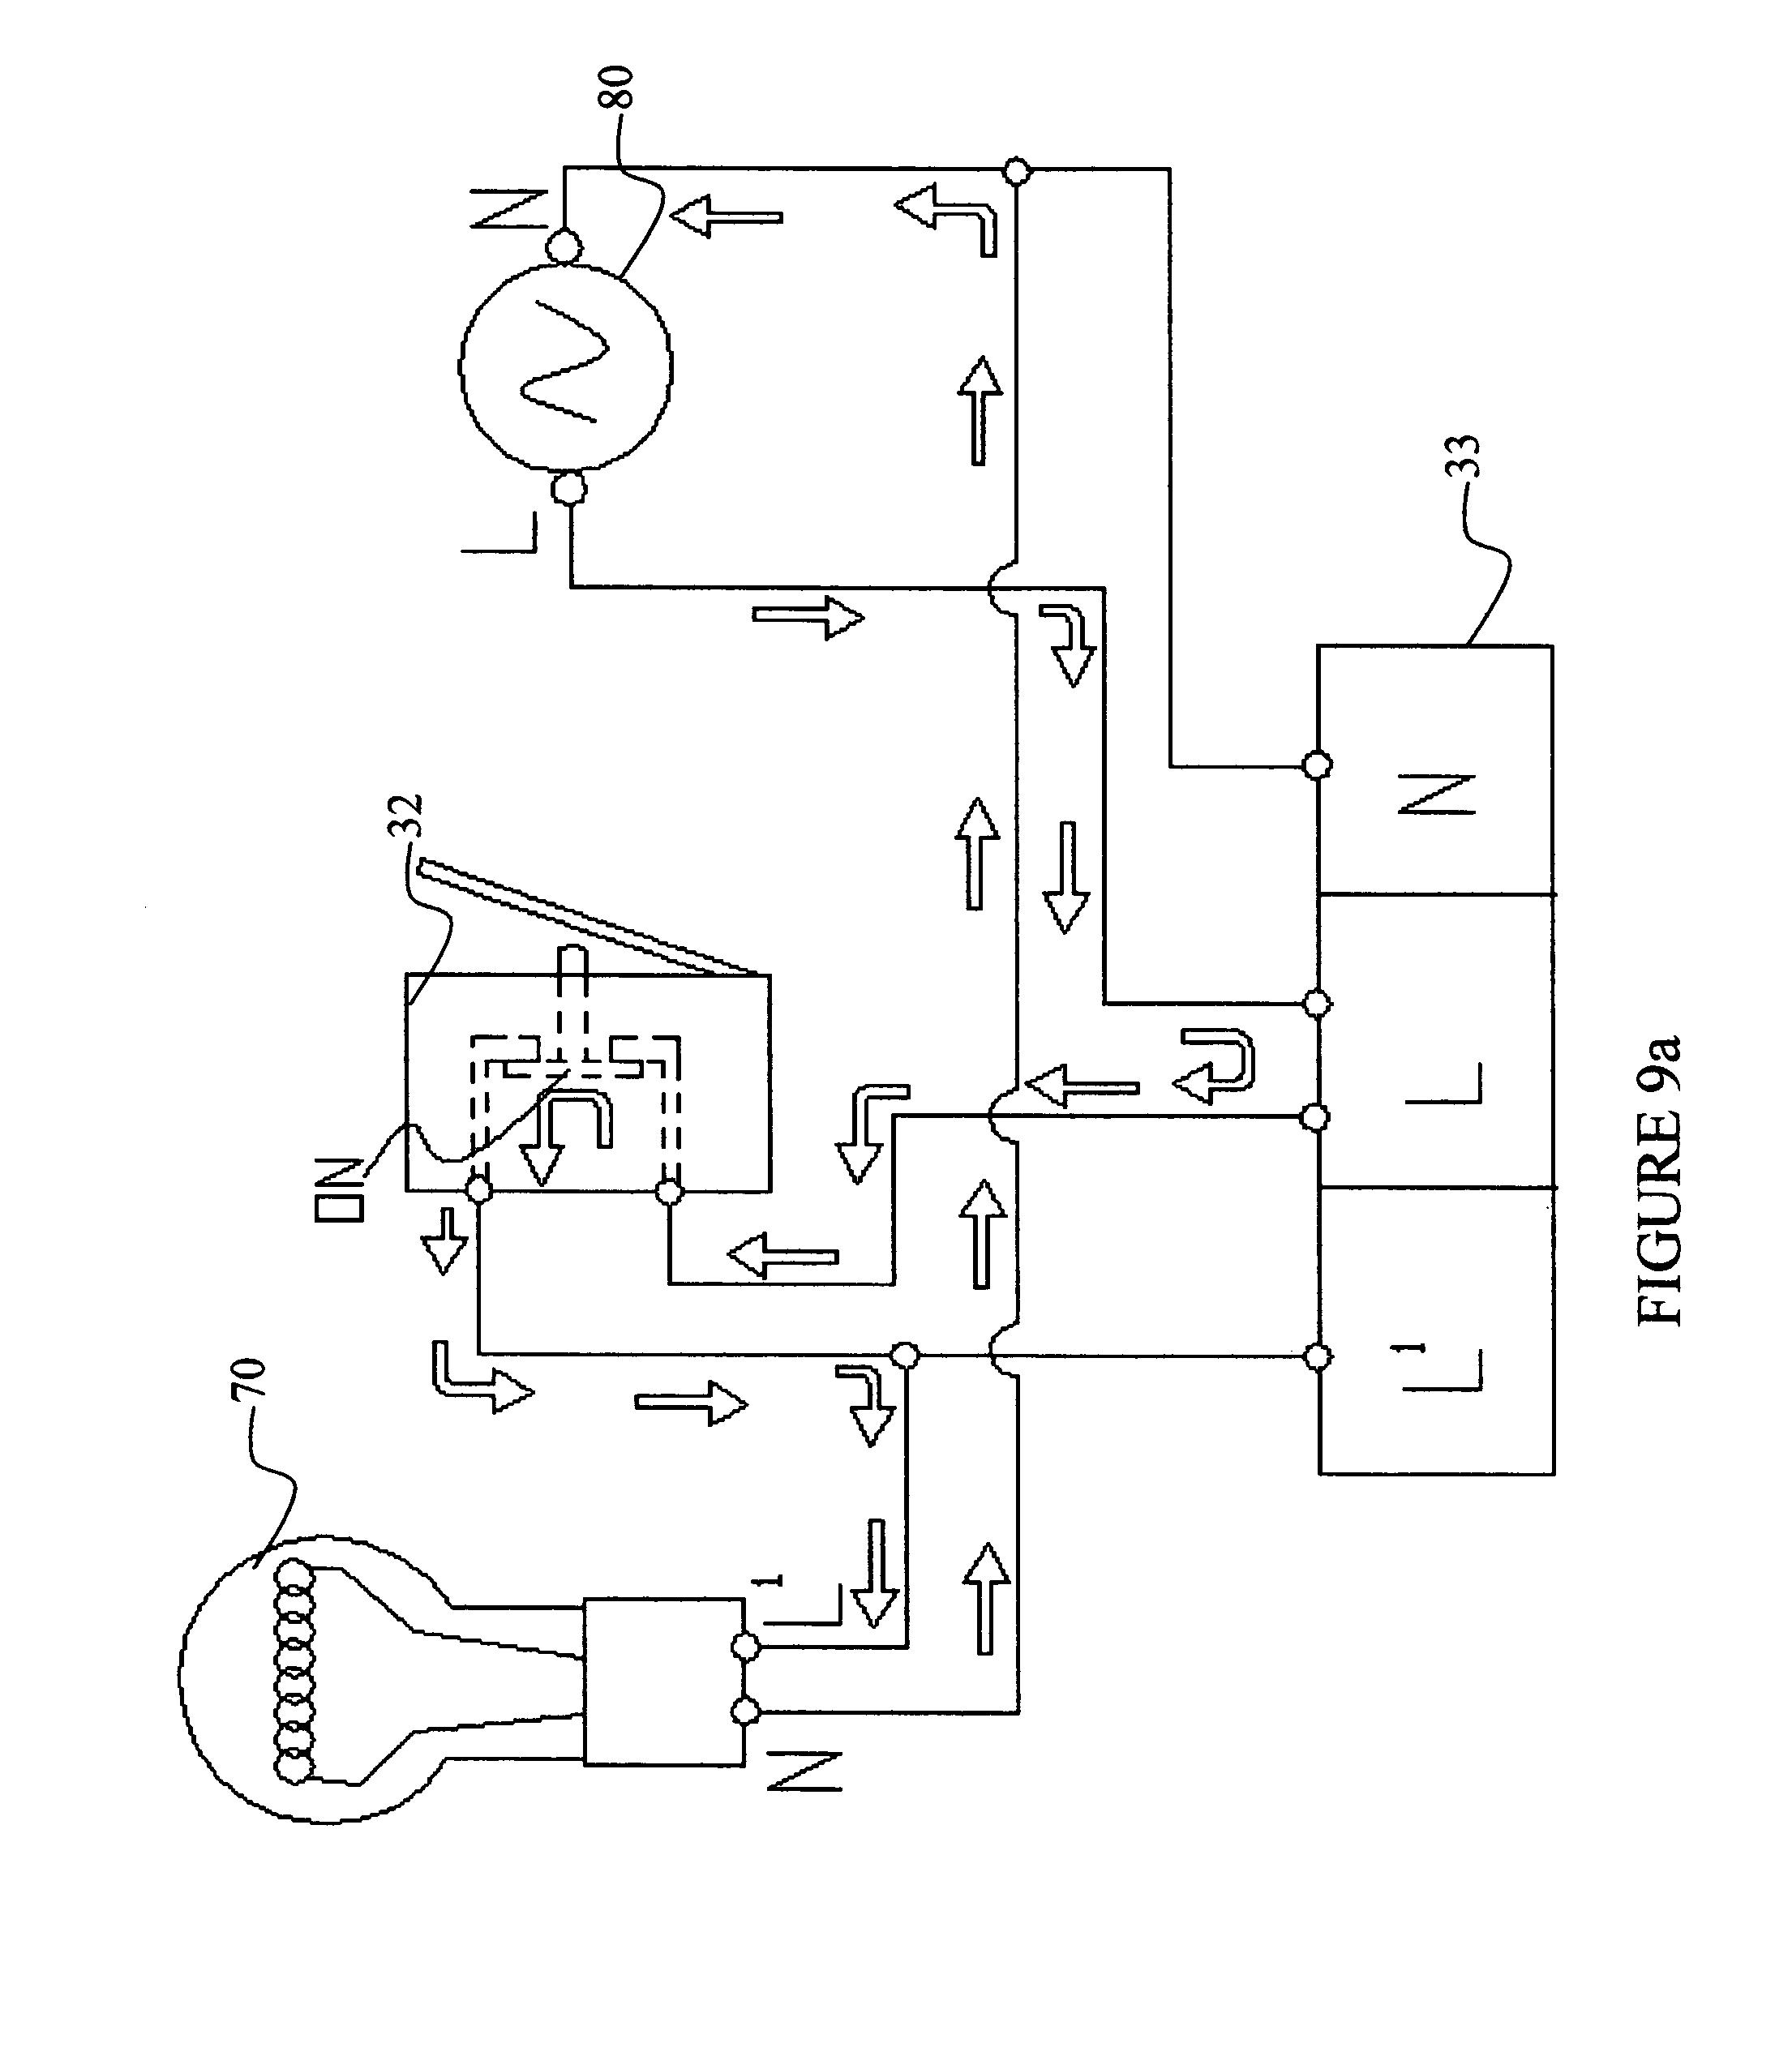 pir switch wiring diagram loncin quad bike steinel sensor 29 images